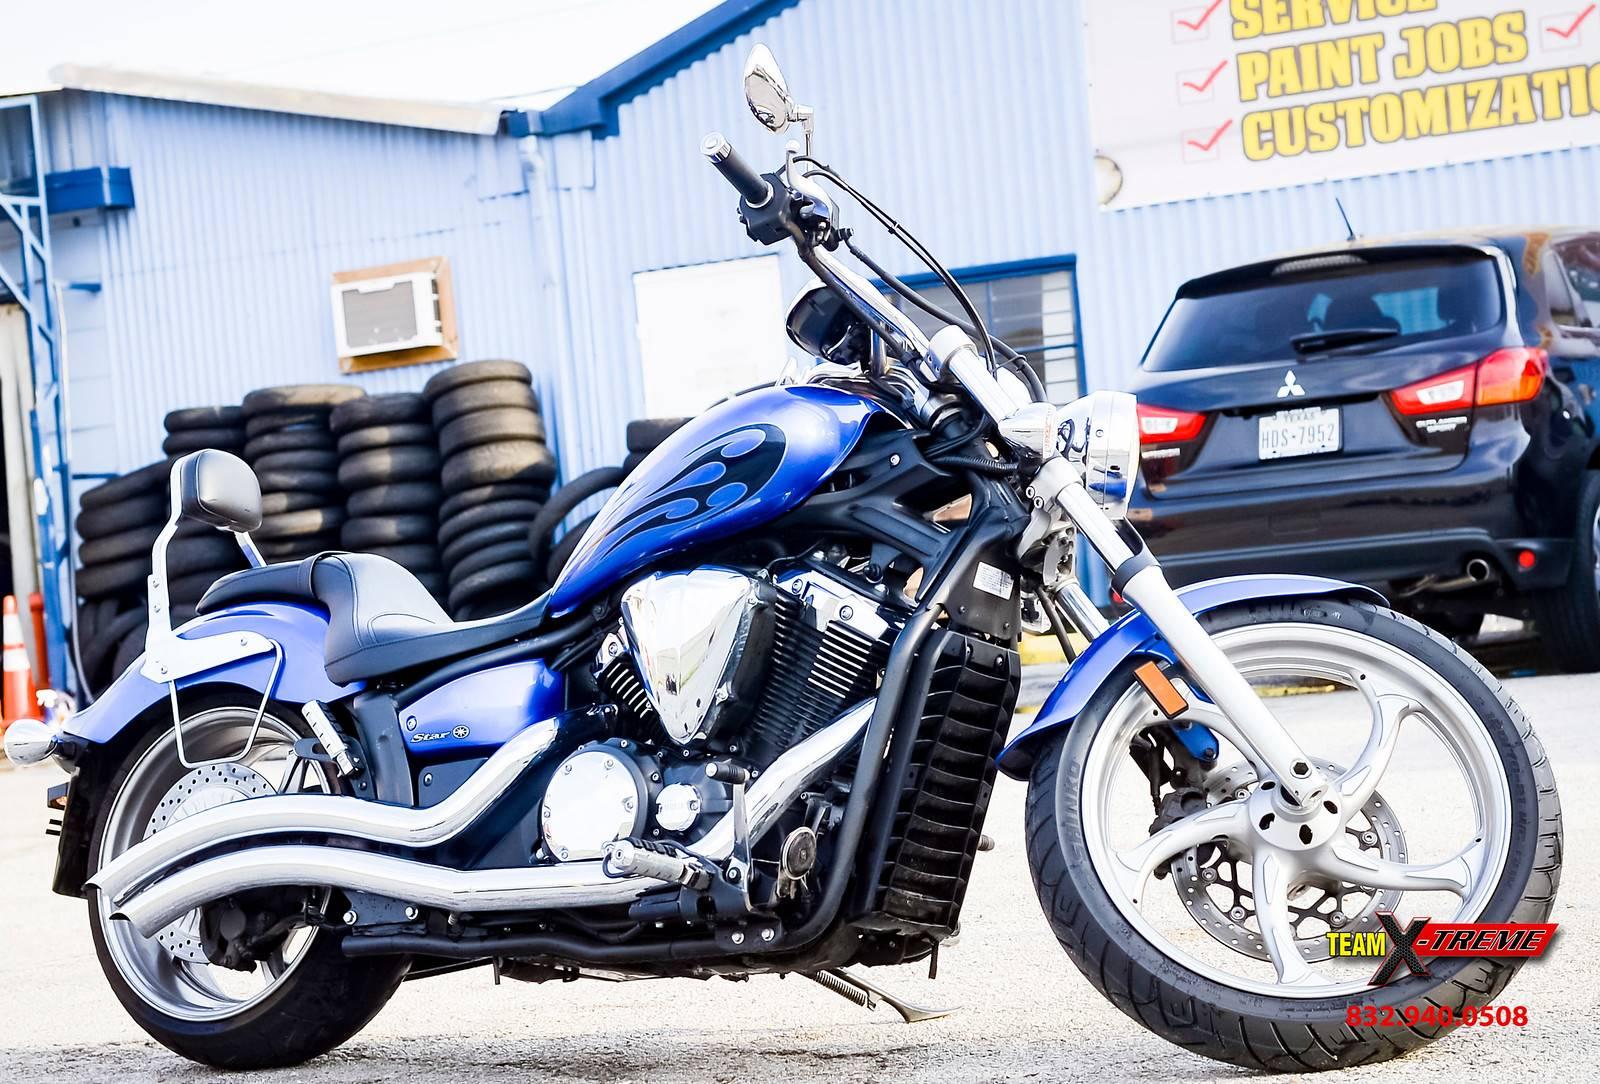 2011 Yamaha Stryker for sale 67511